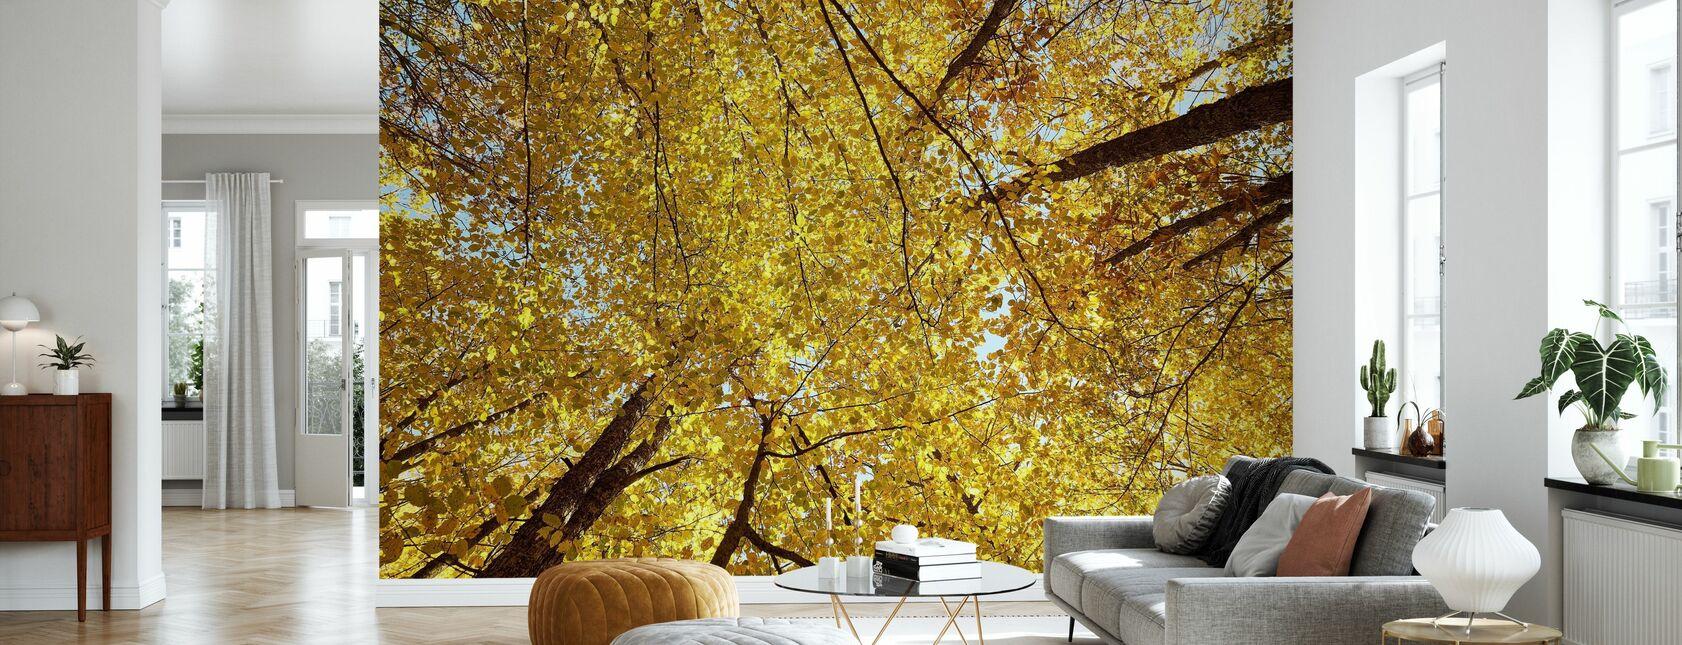 Yellow Autumn Leaves - Wallpaper - Living Room